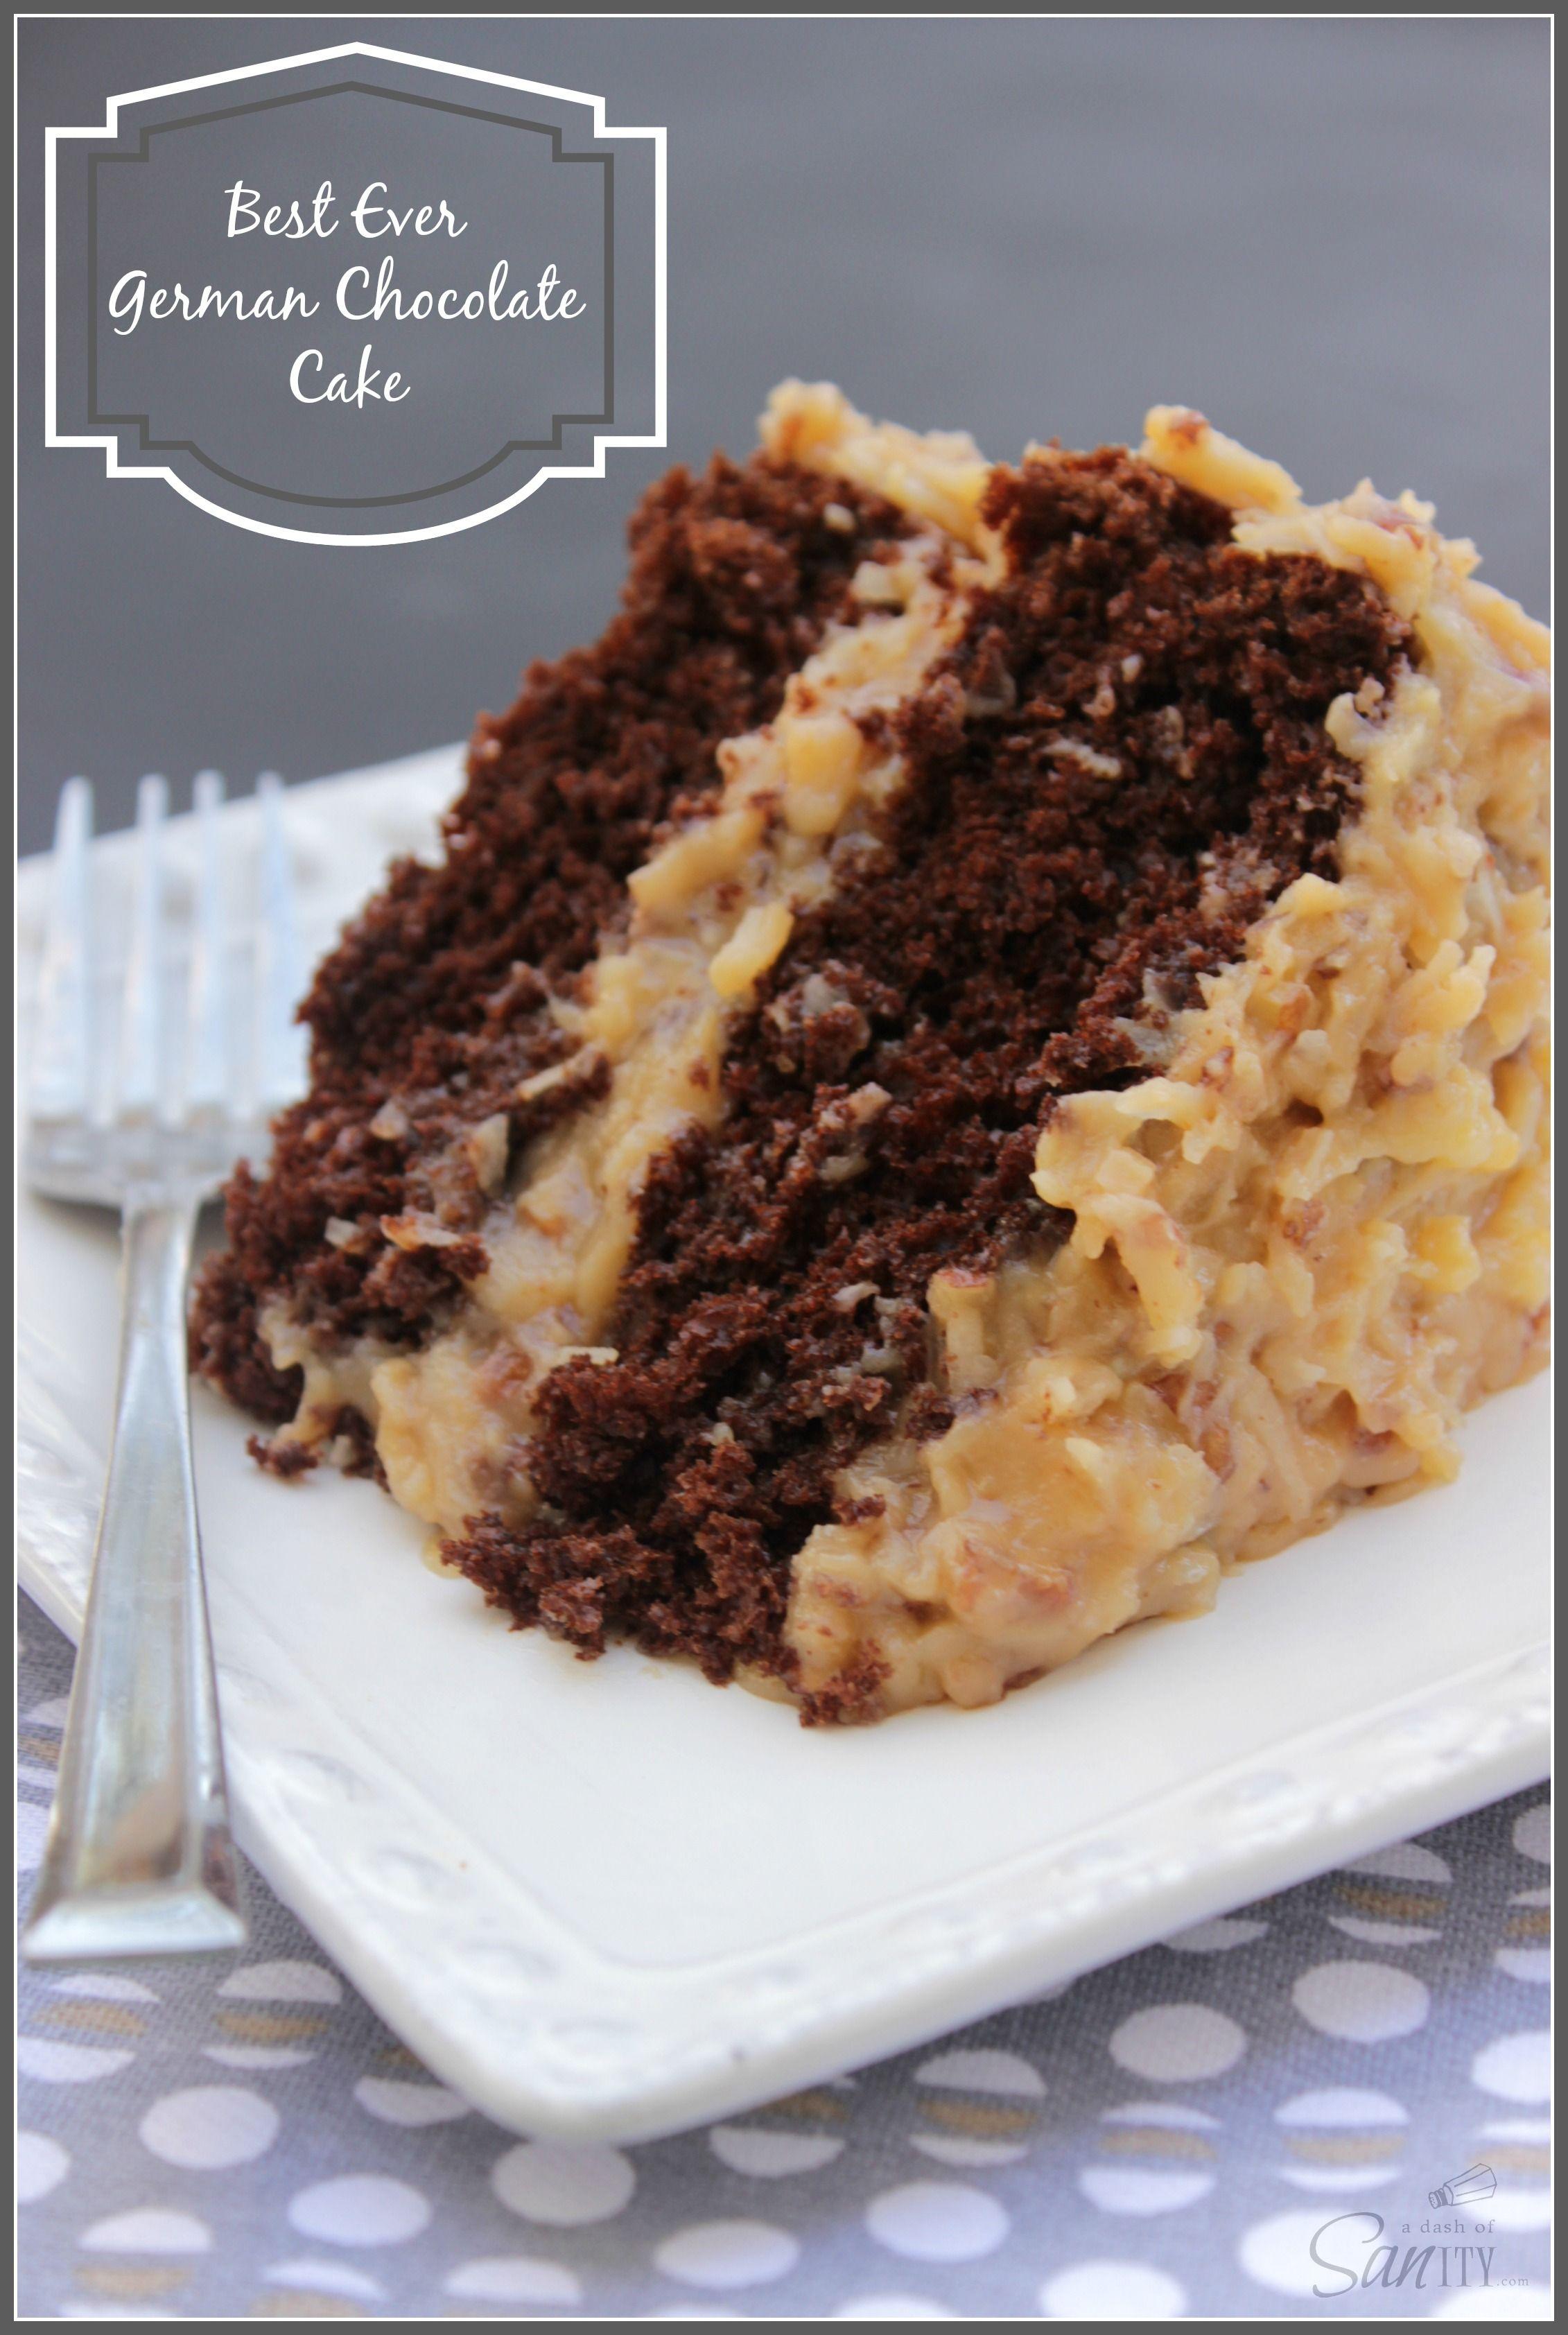 Best Ever German Chocolate Cake Recipe German chocolate